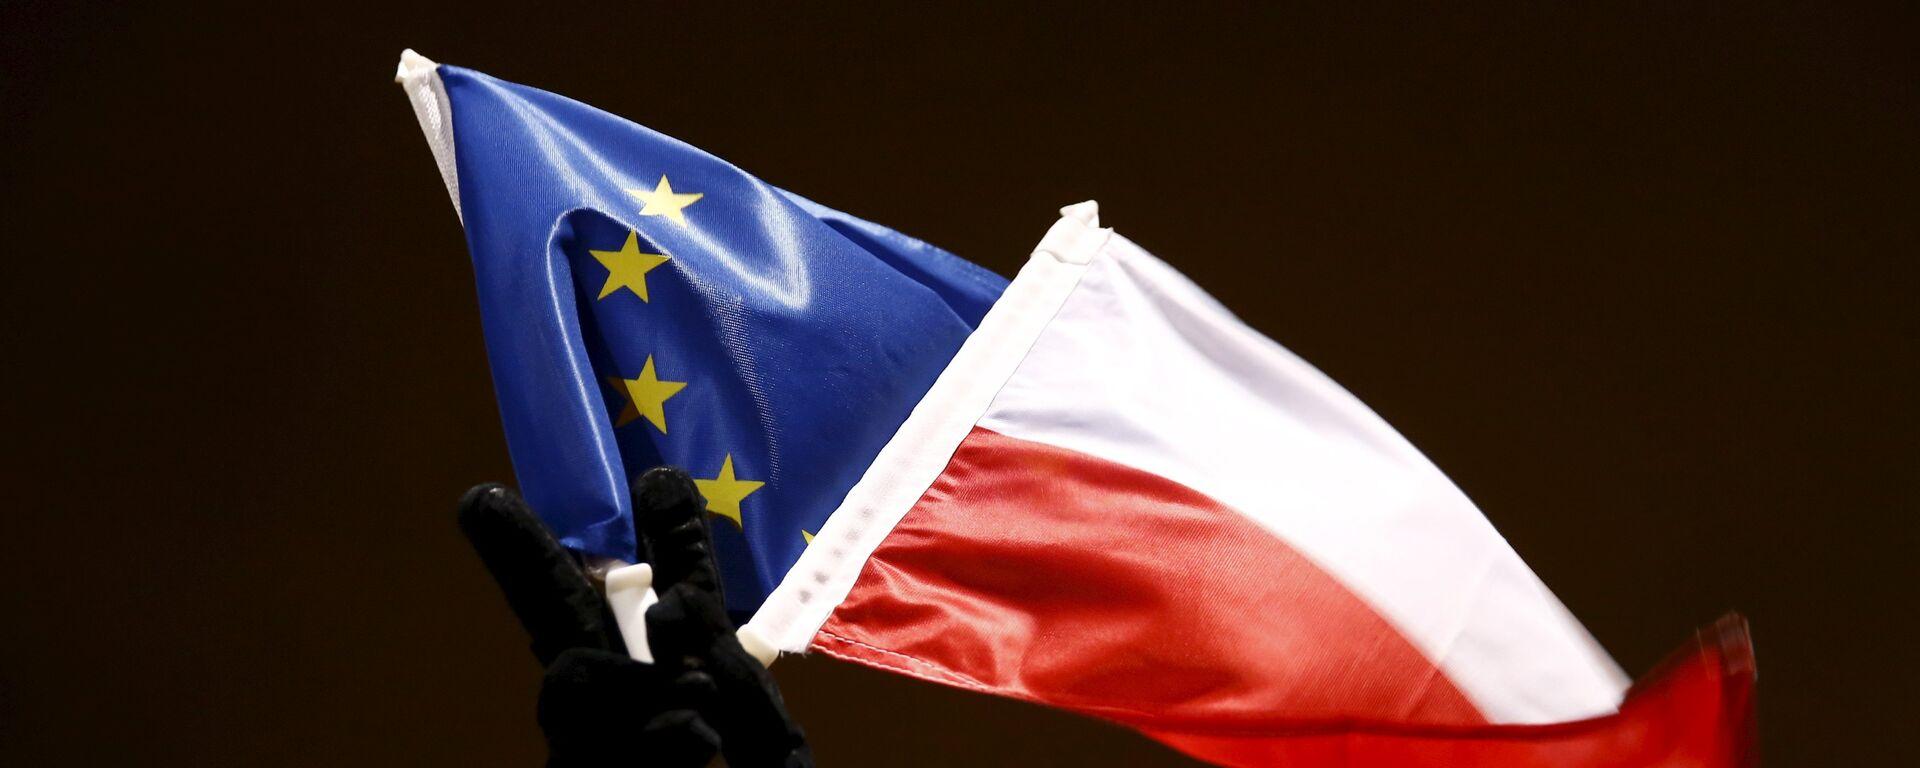 Vlajky EU a Polska - Sputnik Česká republika, 1920, 10.09.2021